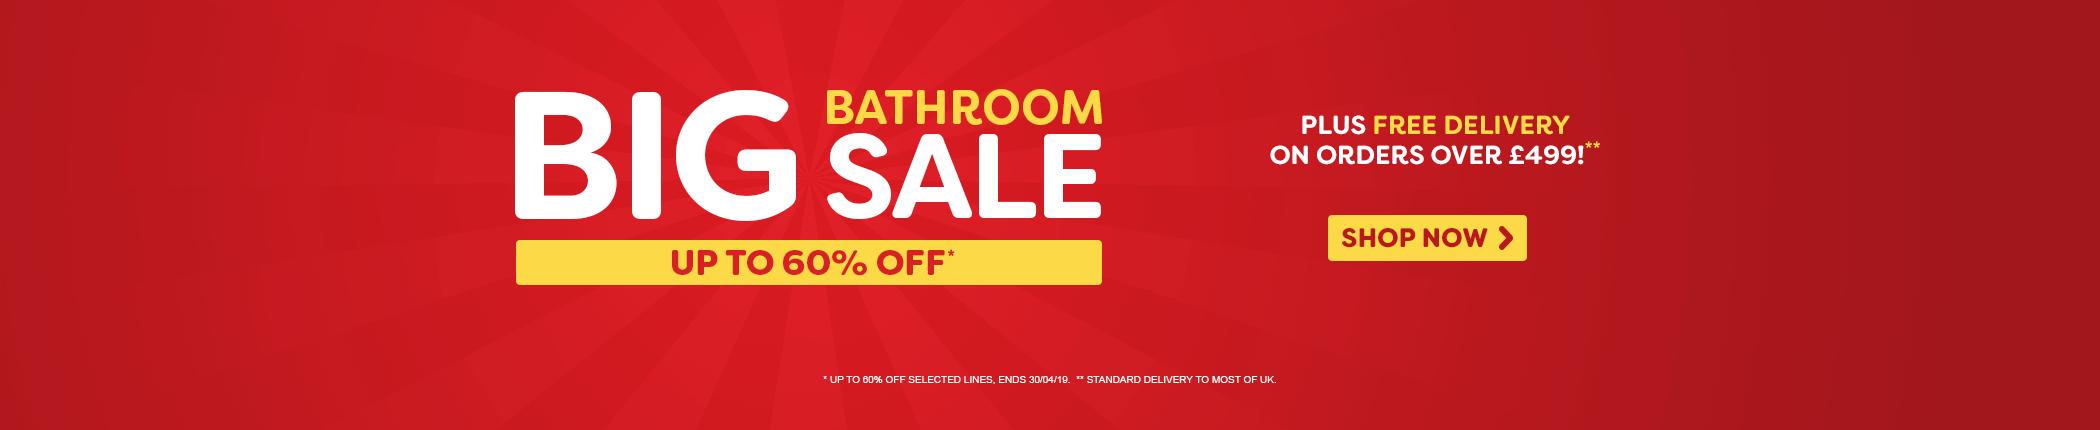 Big Bathroom Sale